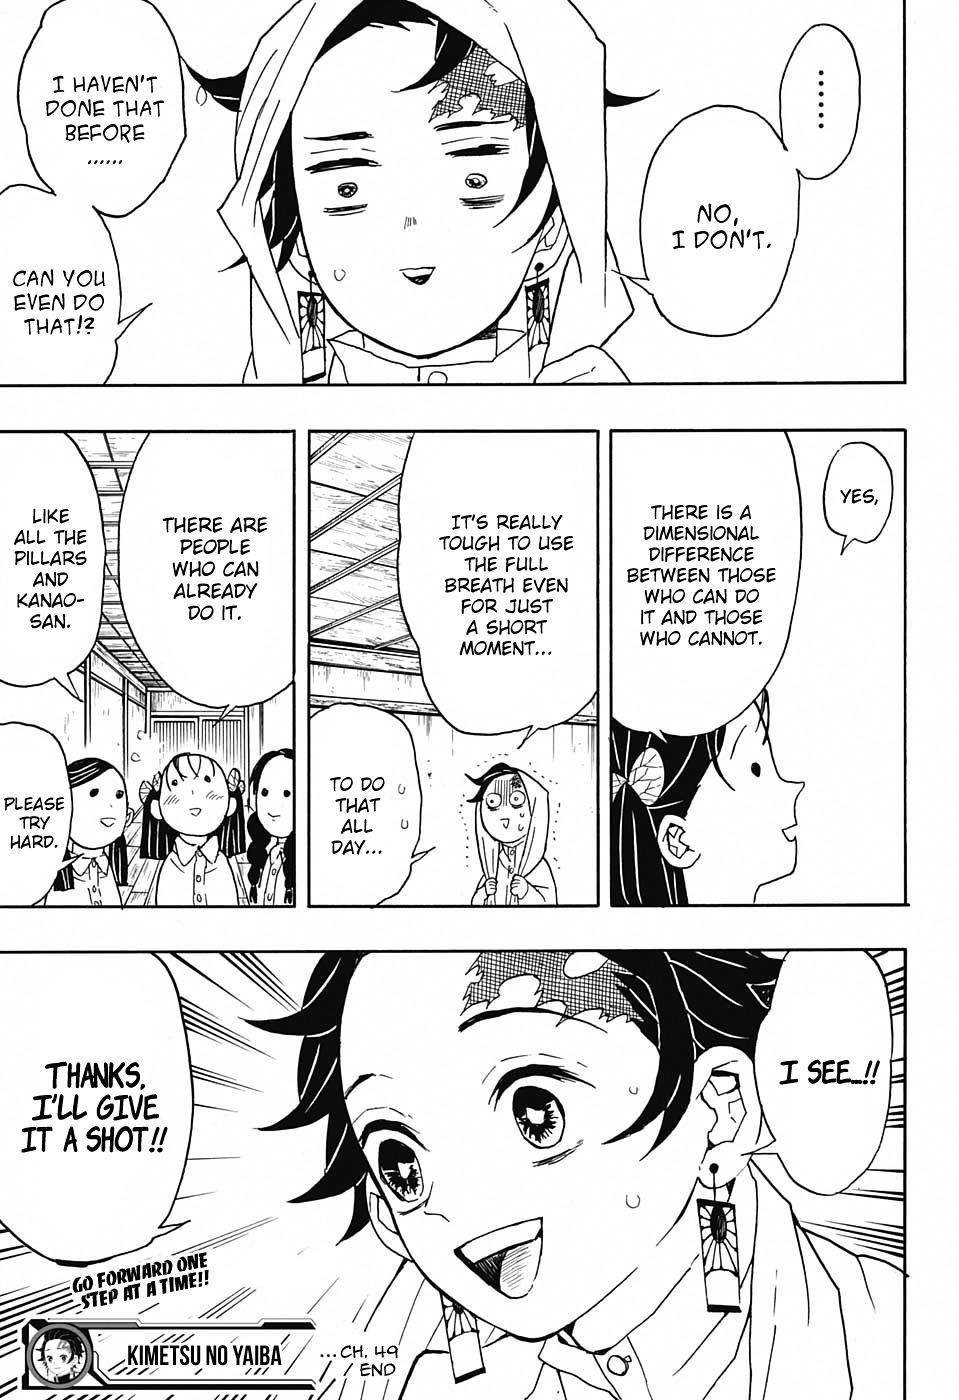 Kimetsu no Yaiba Chapter 49  Online Free Manga Read Image 20